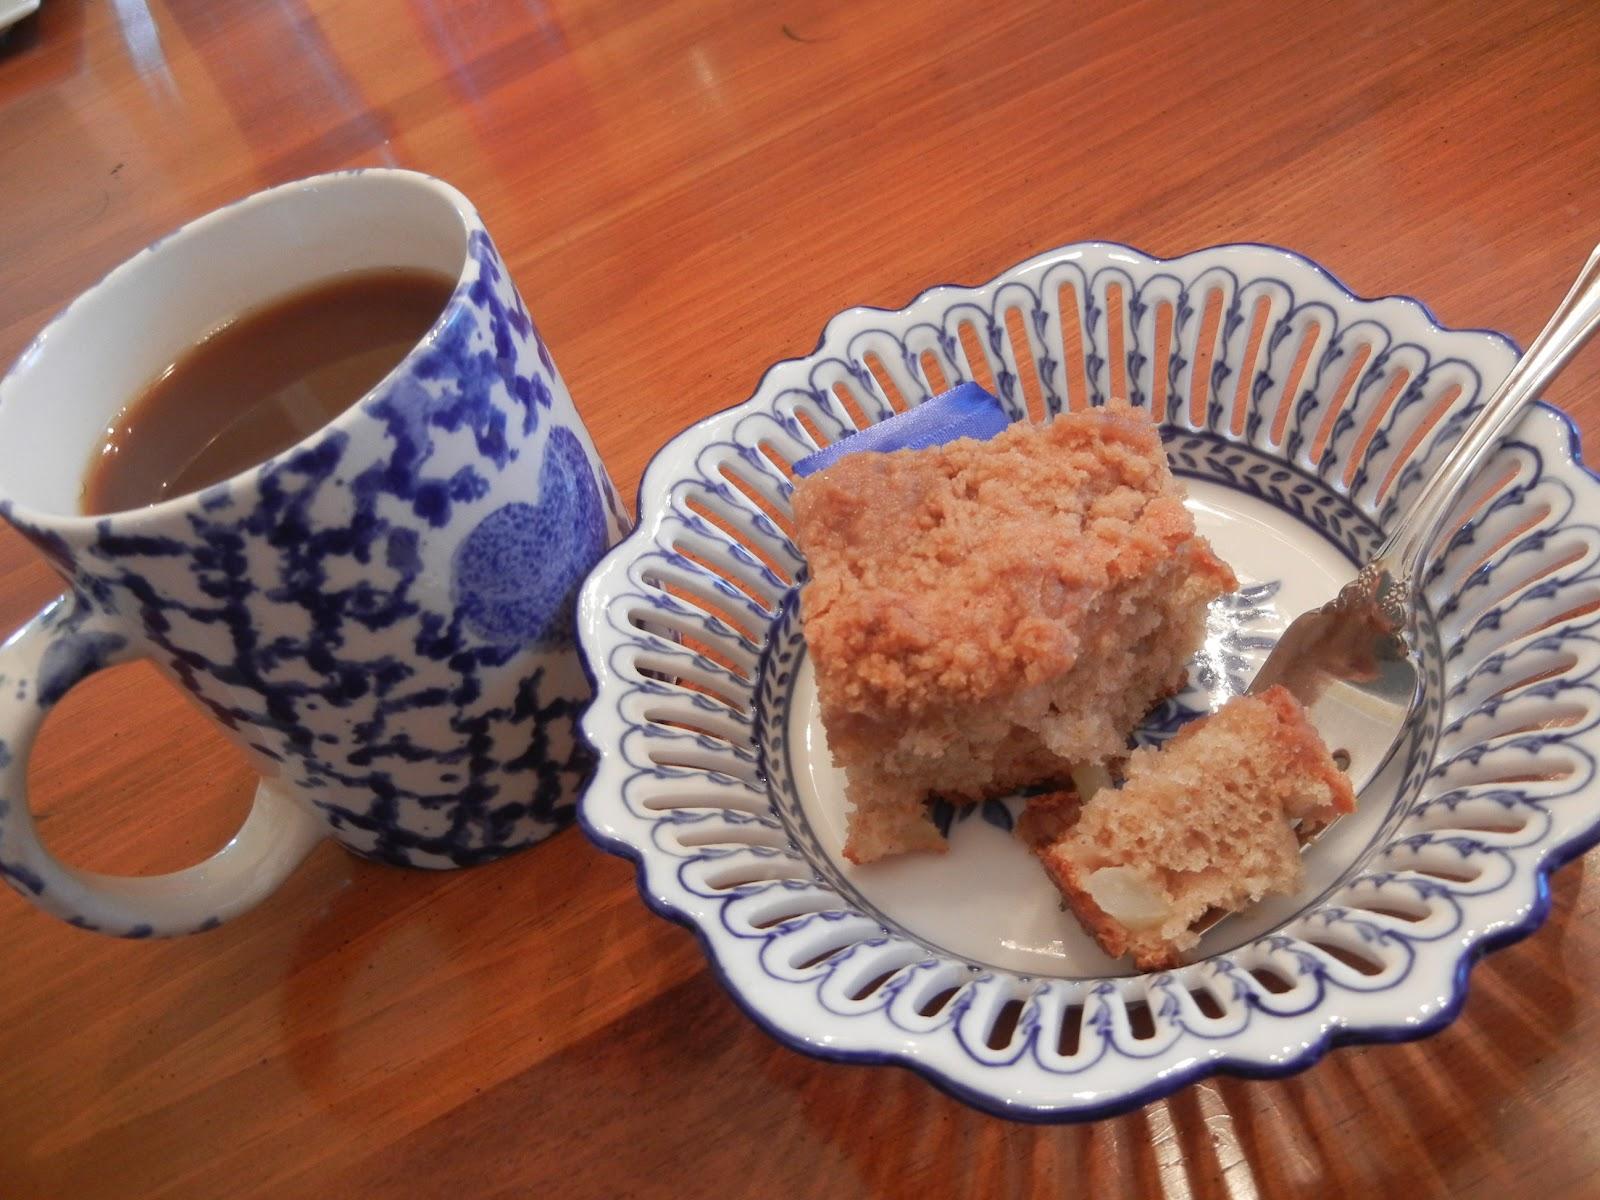 Kristen's Cupcakery: Breakfast of a Champion